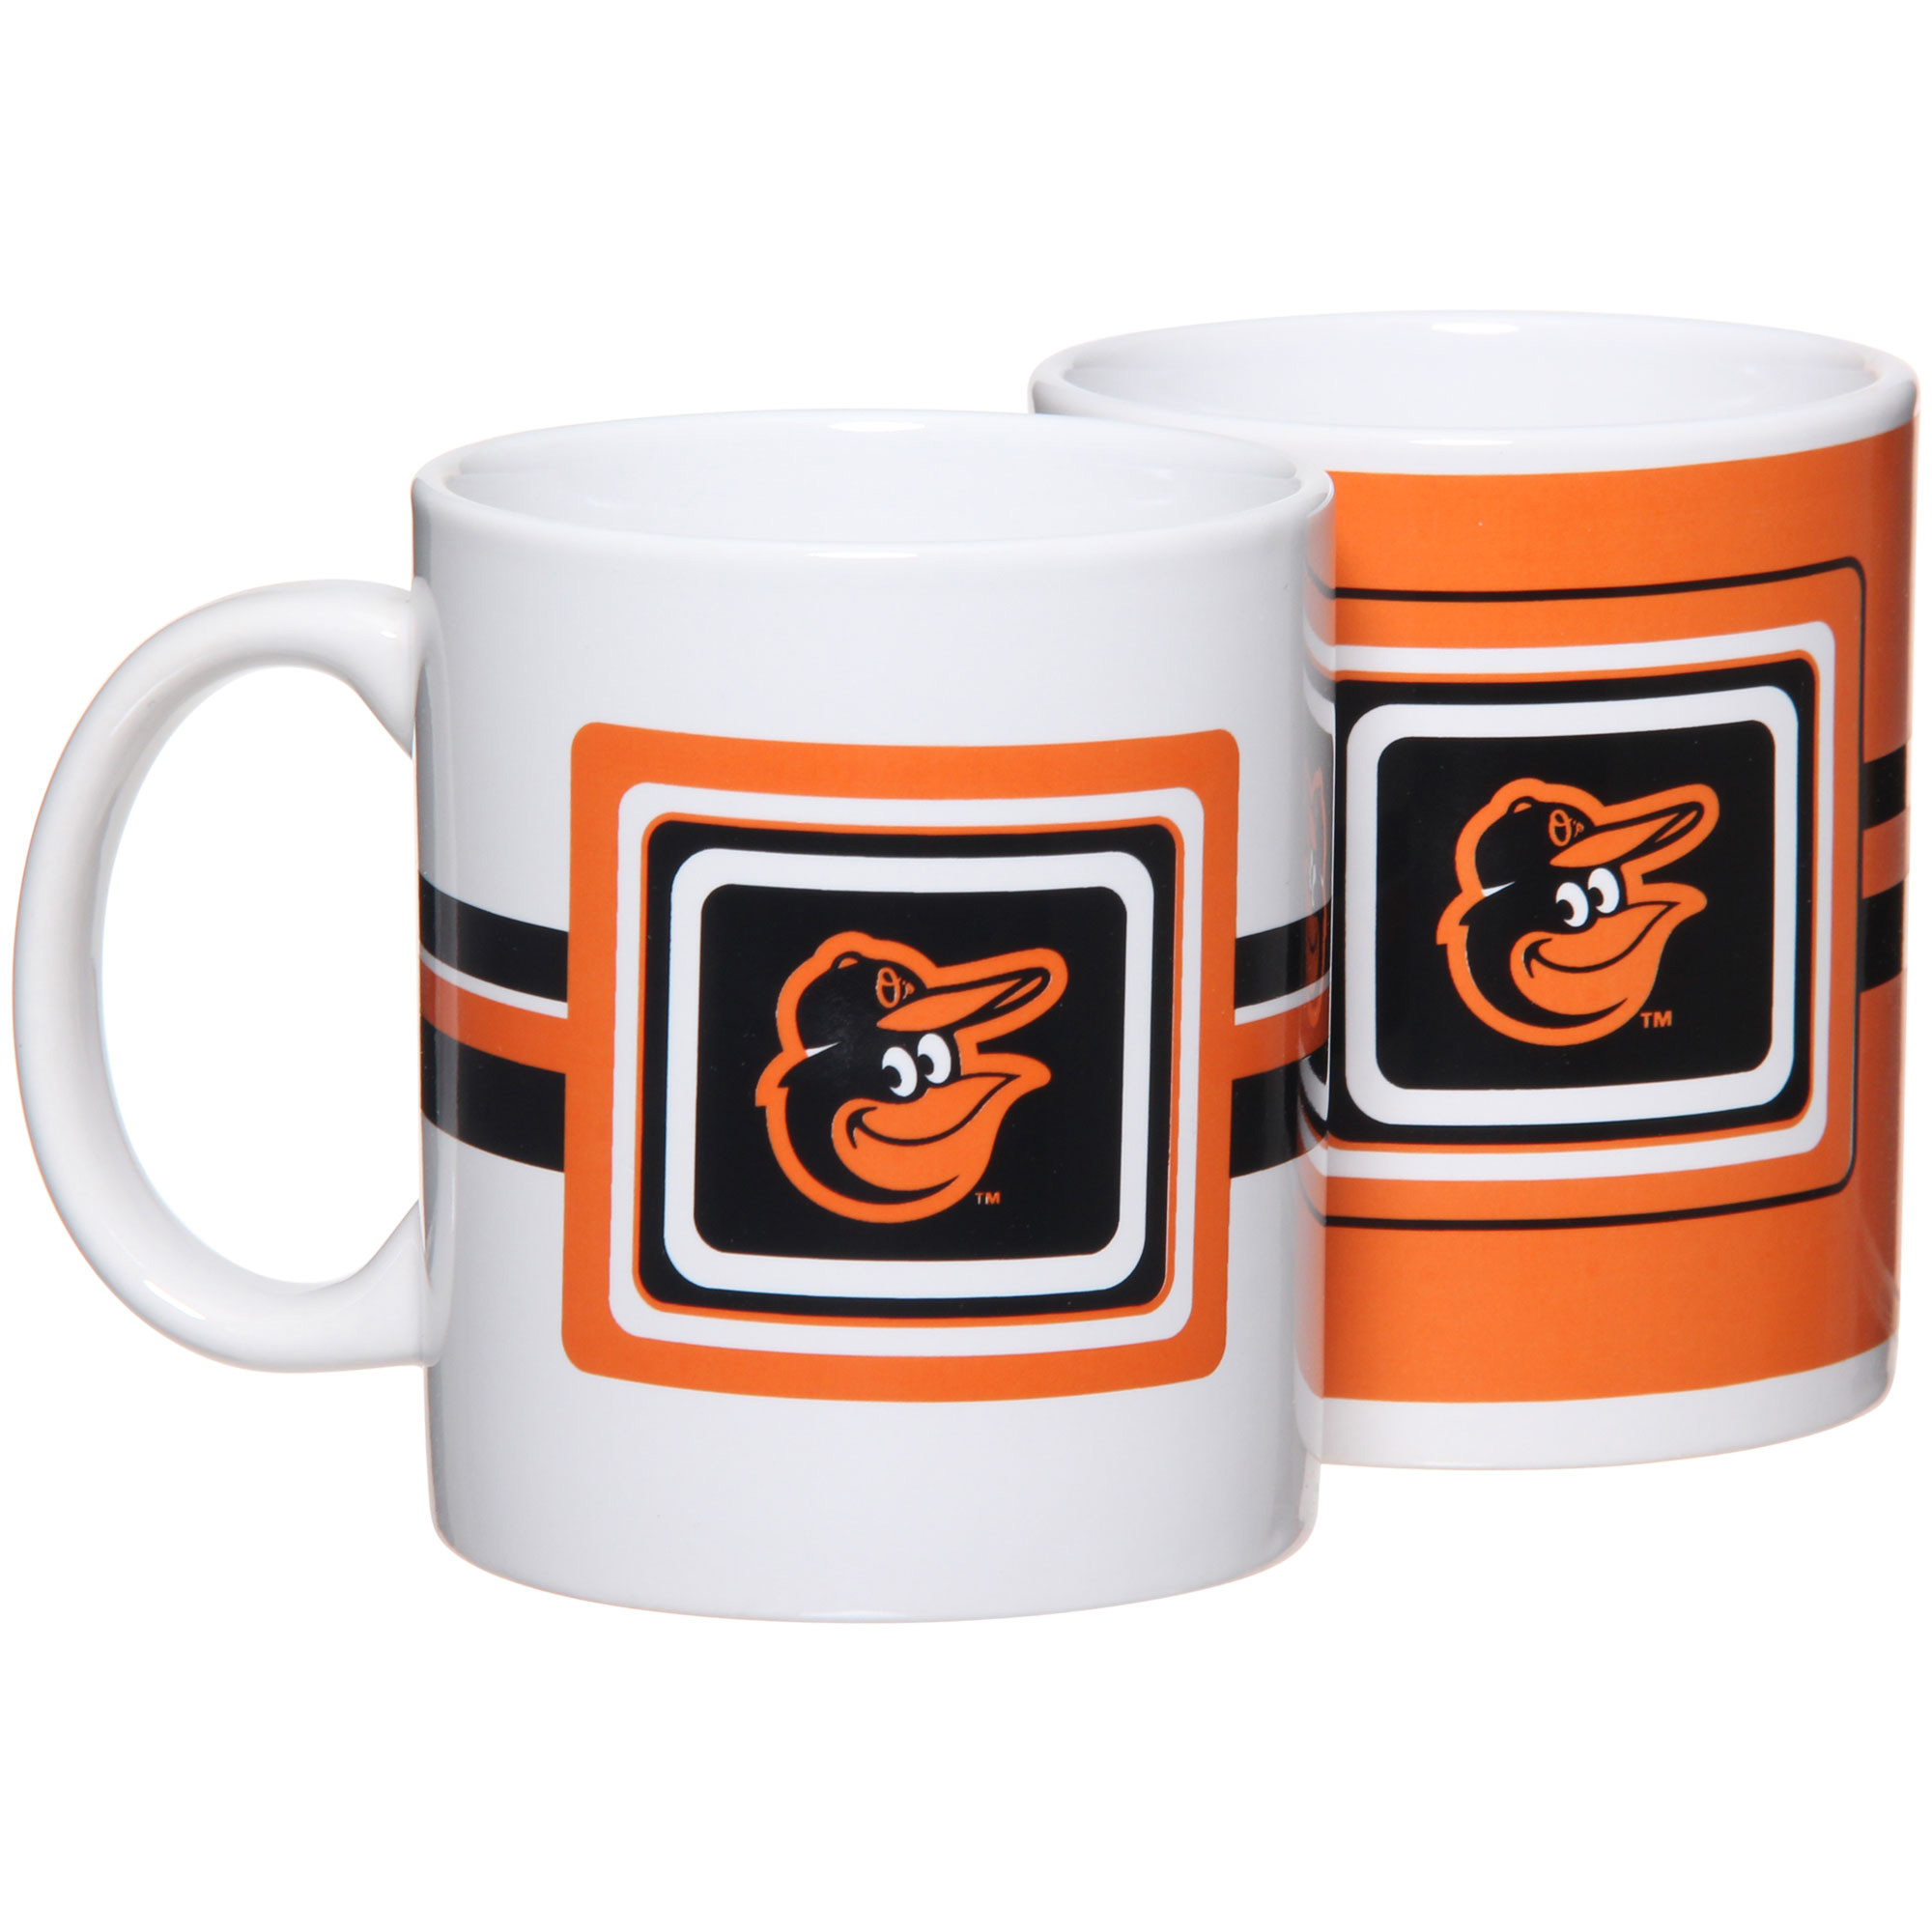 Baltimore Orioles 11oz. Two-Pack Mug Set - No Size